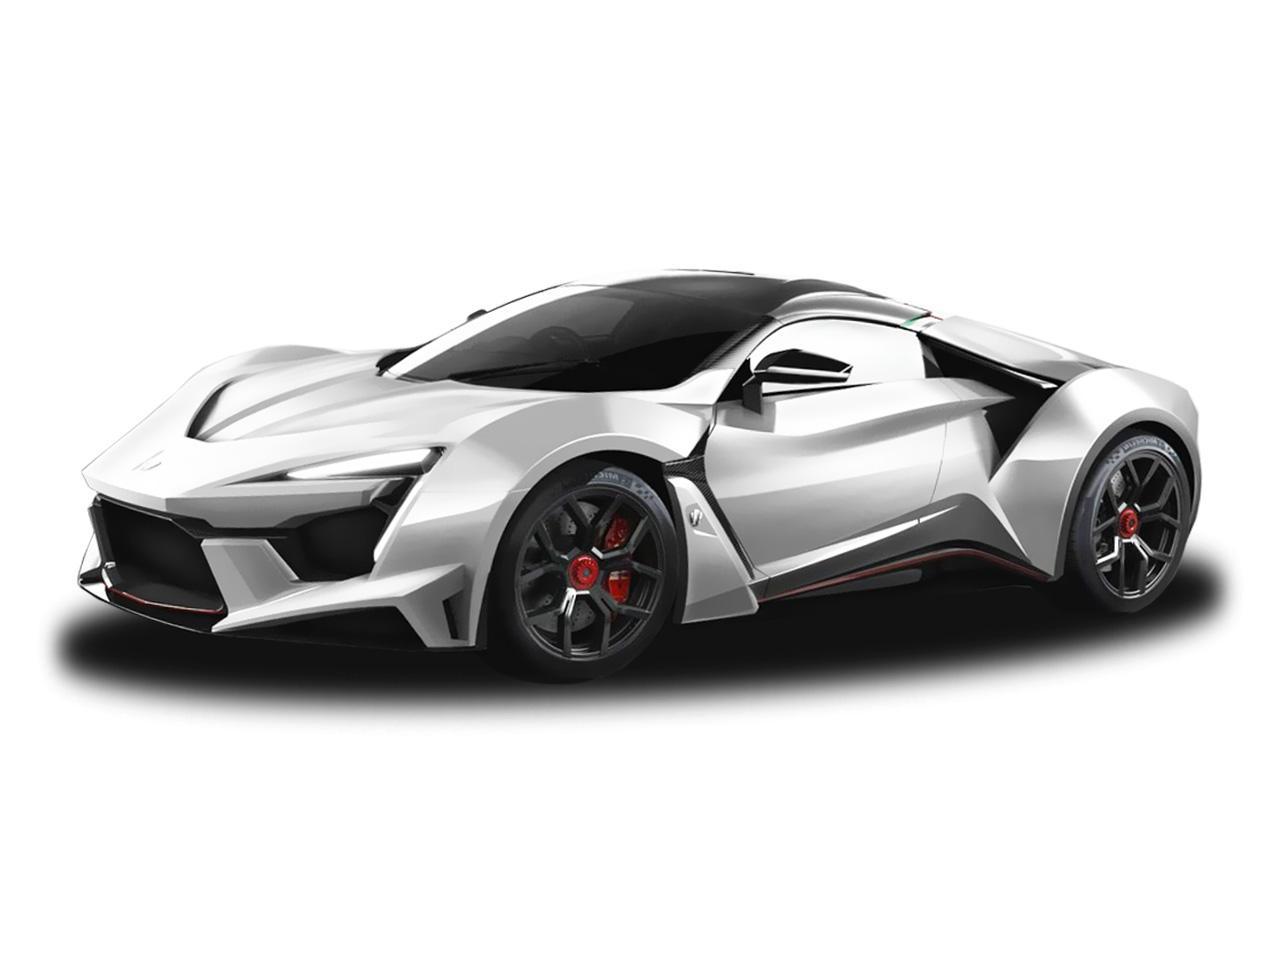 W motors fenyr supersport price in uae new w motors for W motors lykan hypersport price